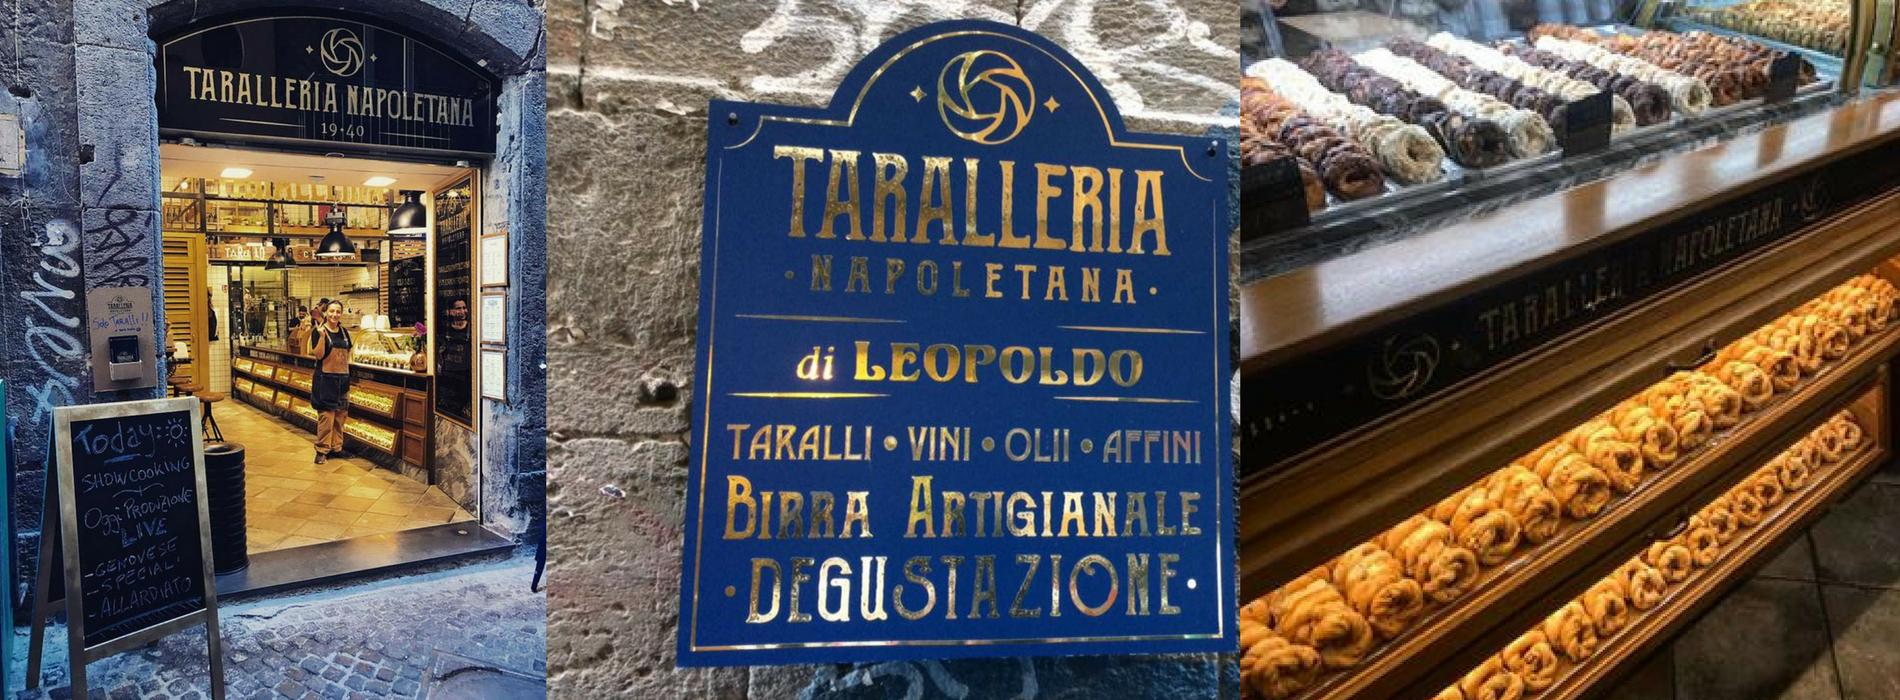 La taralleria napoletana:novità in casa Leopoldo